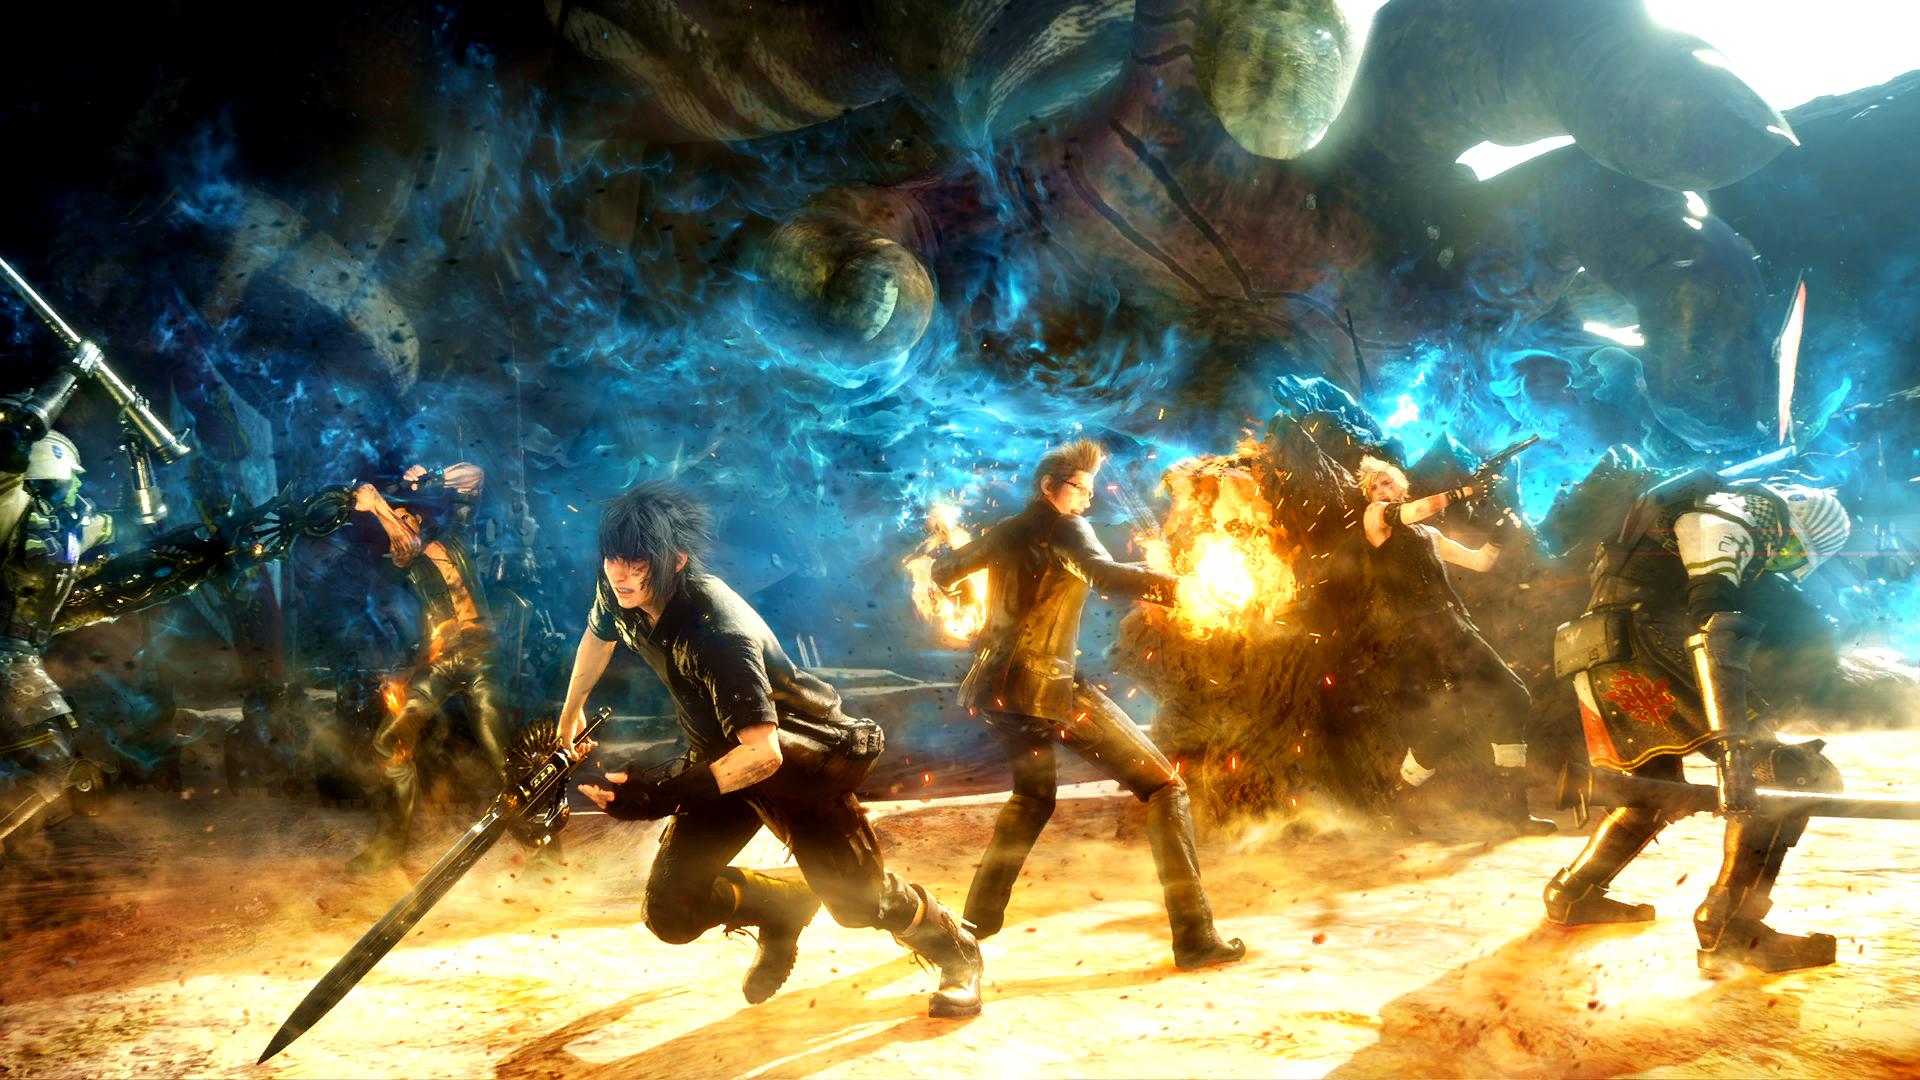 Final Fantasy Xv Final Fantasy Wiki Fandom